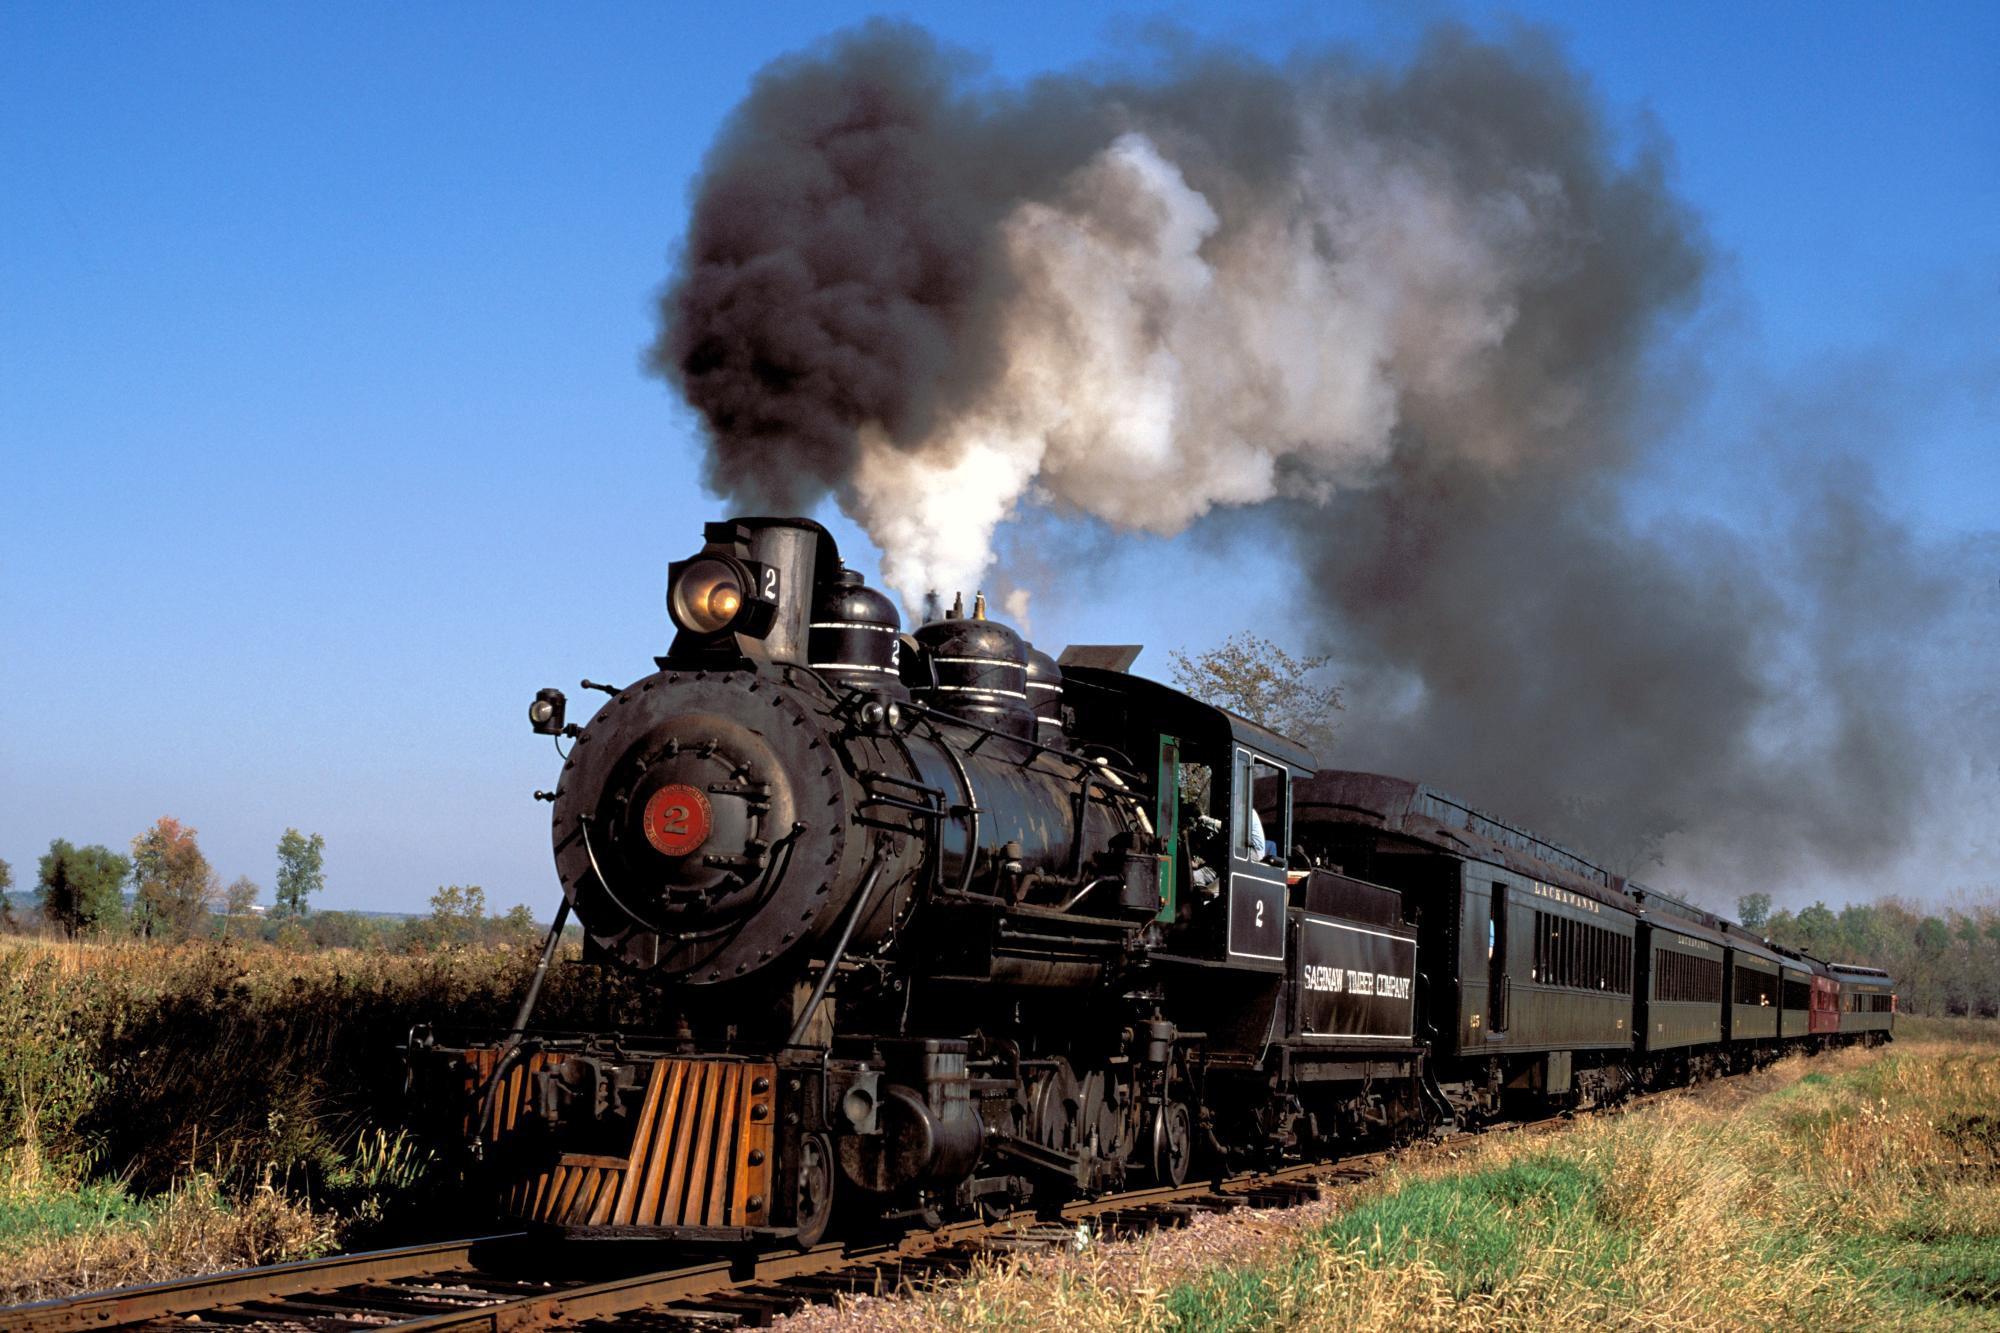 /blockchain-the-train-analogy-b53c1cdc37b0 feature image